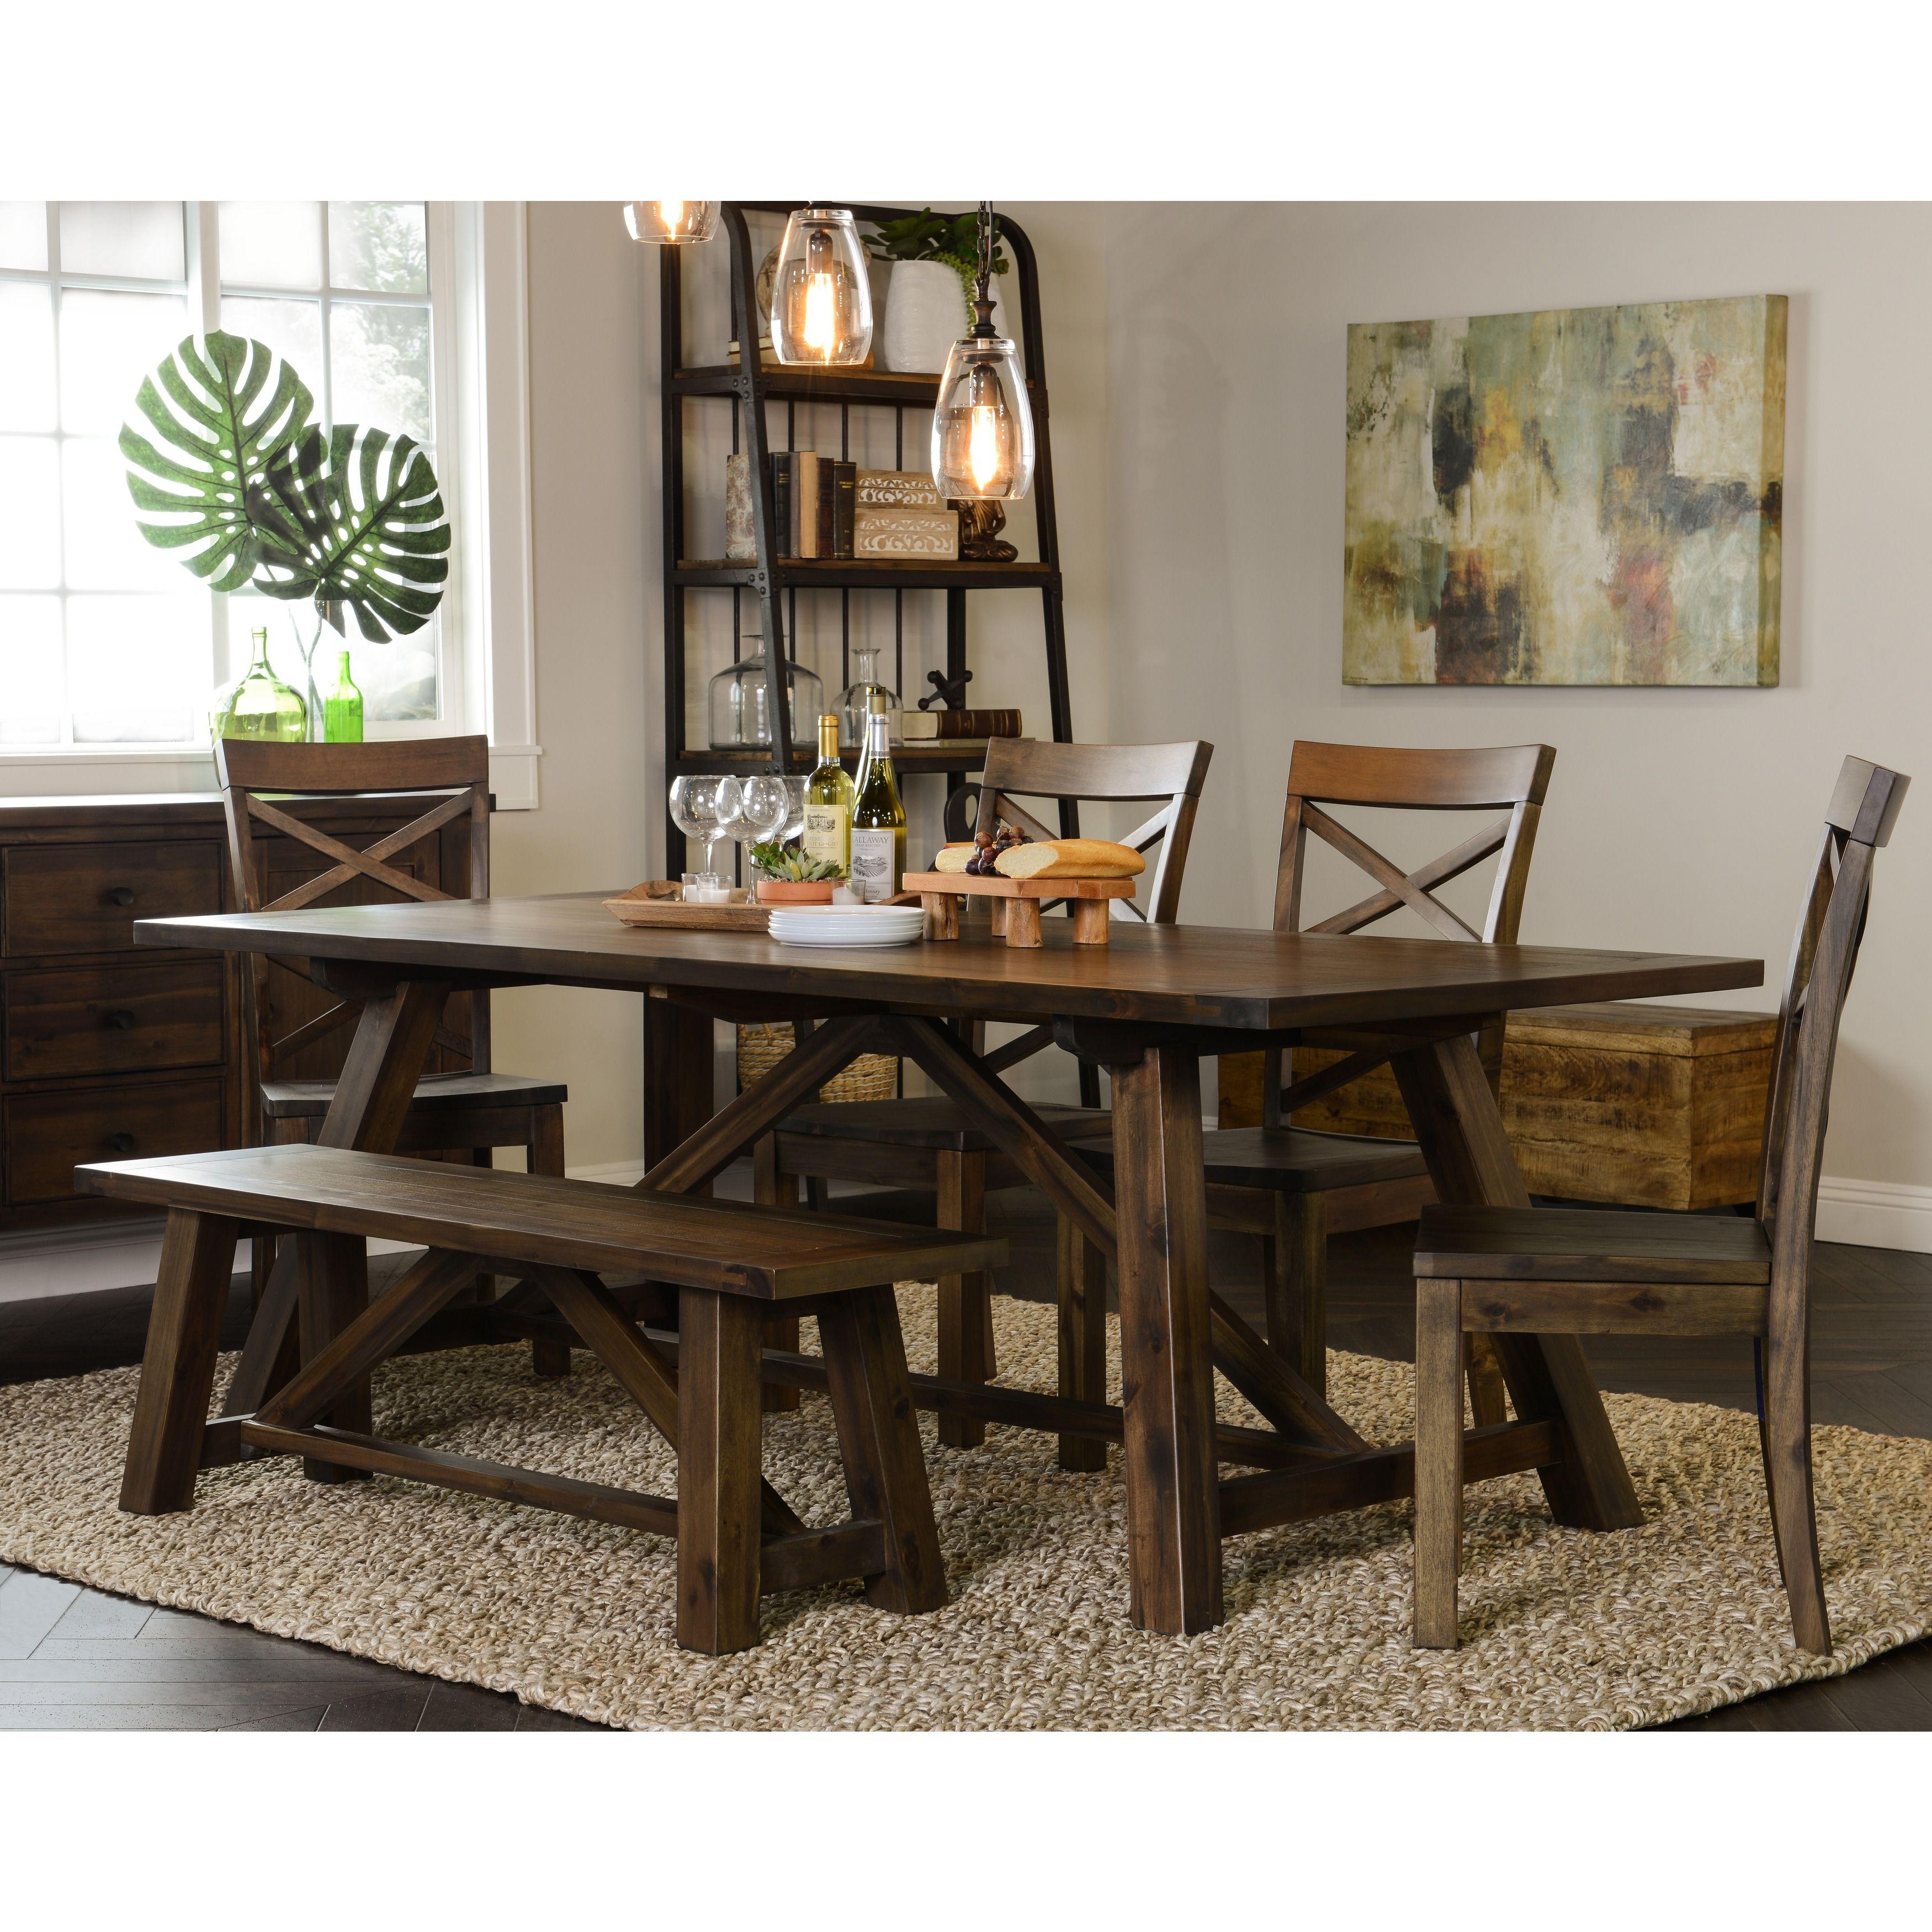 Modern rustic dining room table  Kosas Home Aubrey inch Dining Table by Kosas Home  Shopping